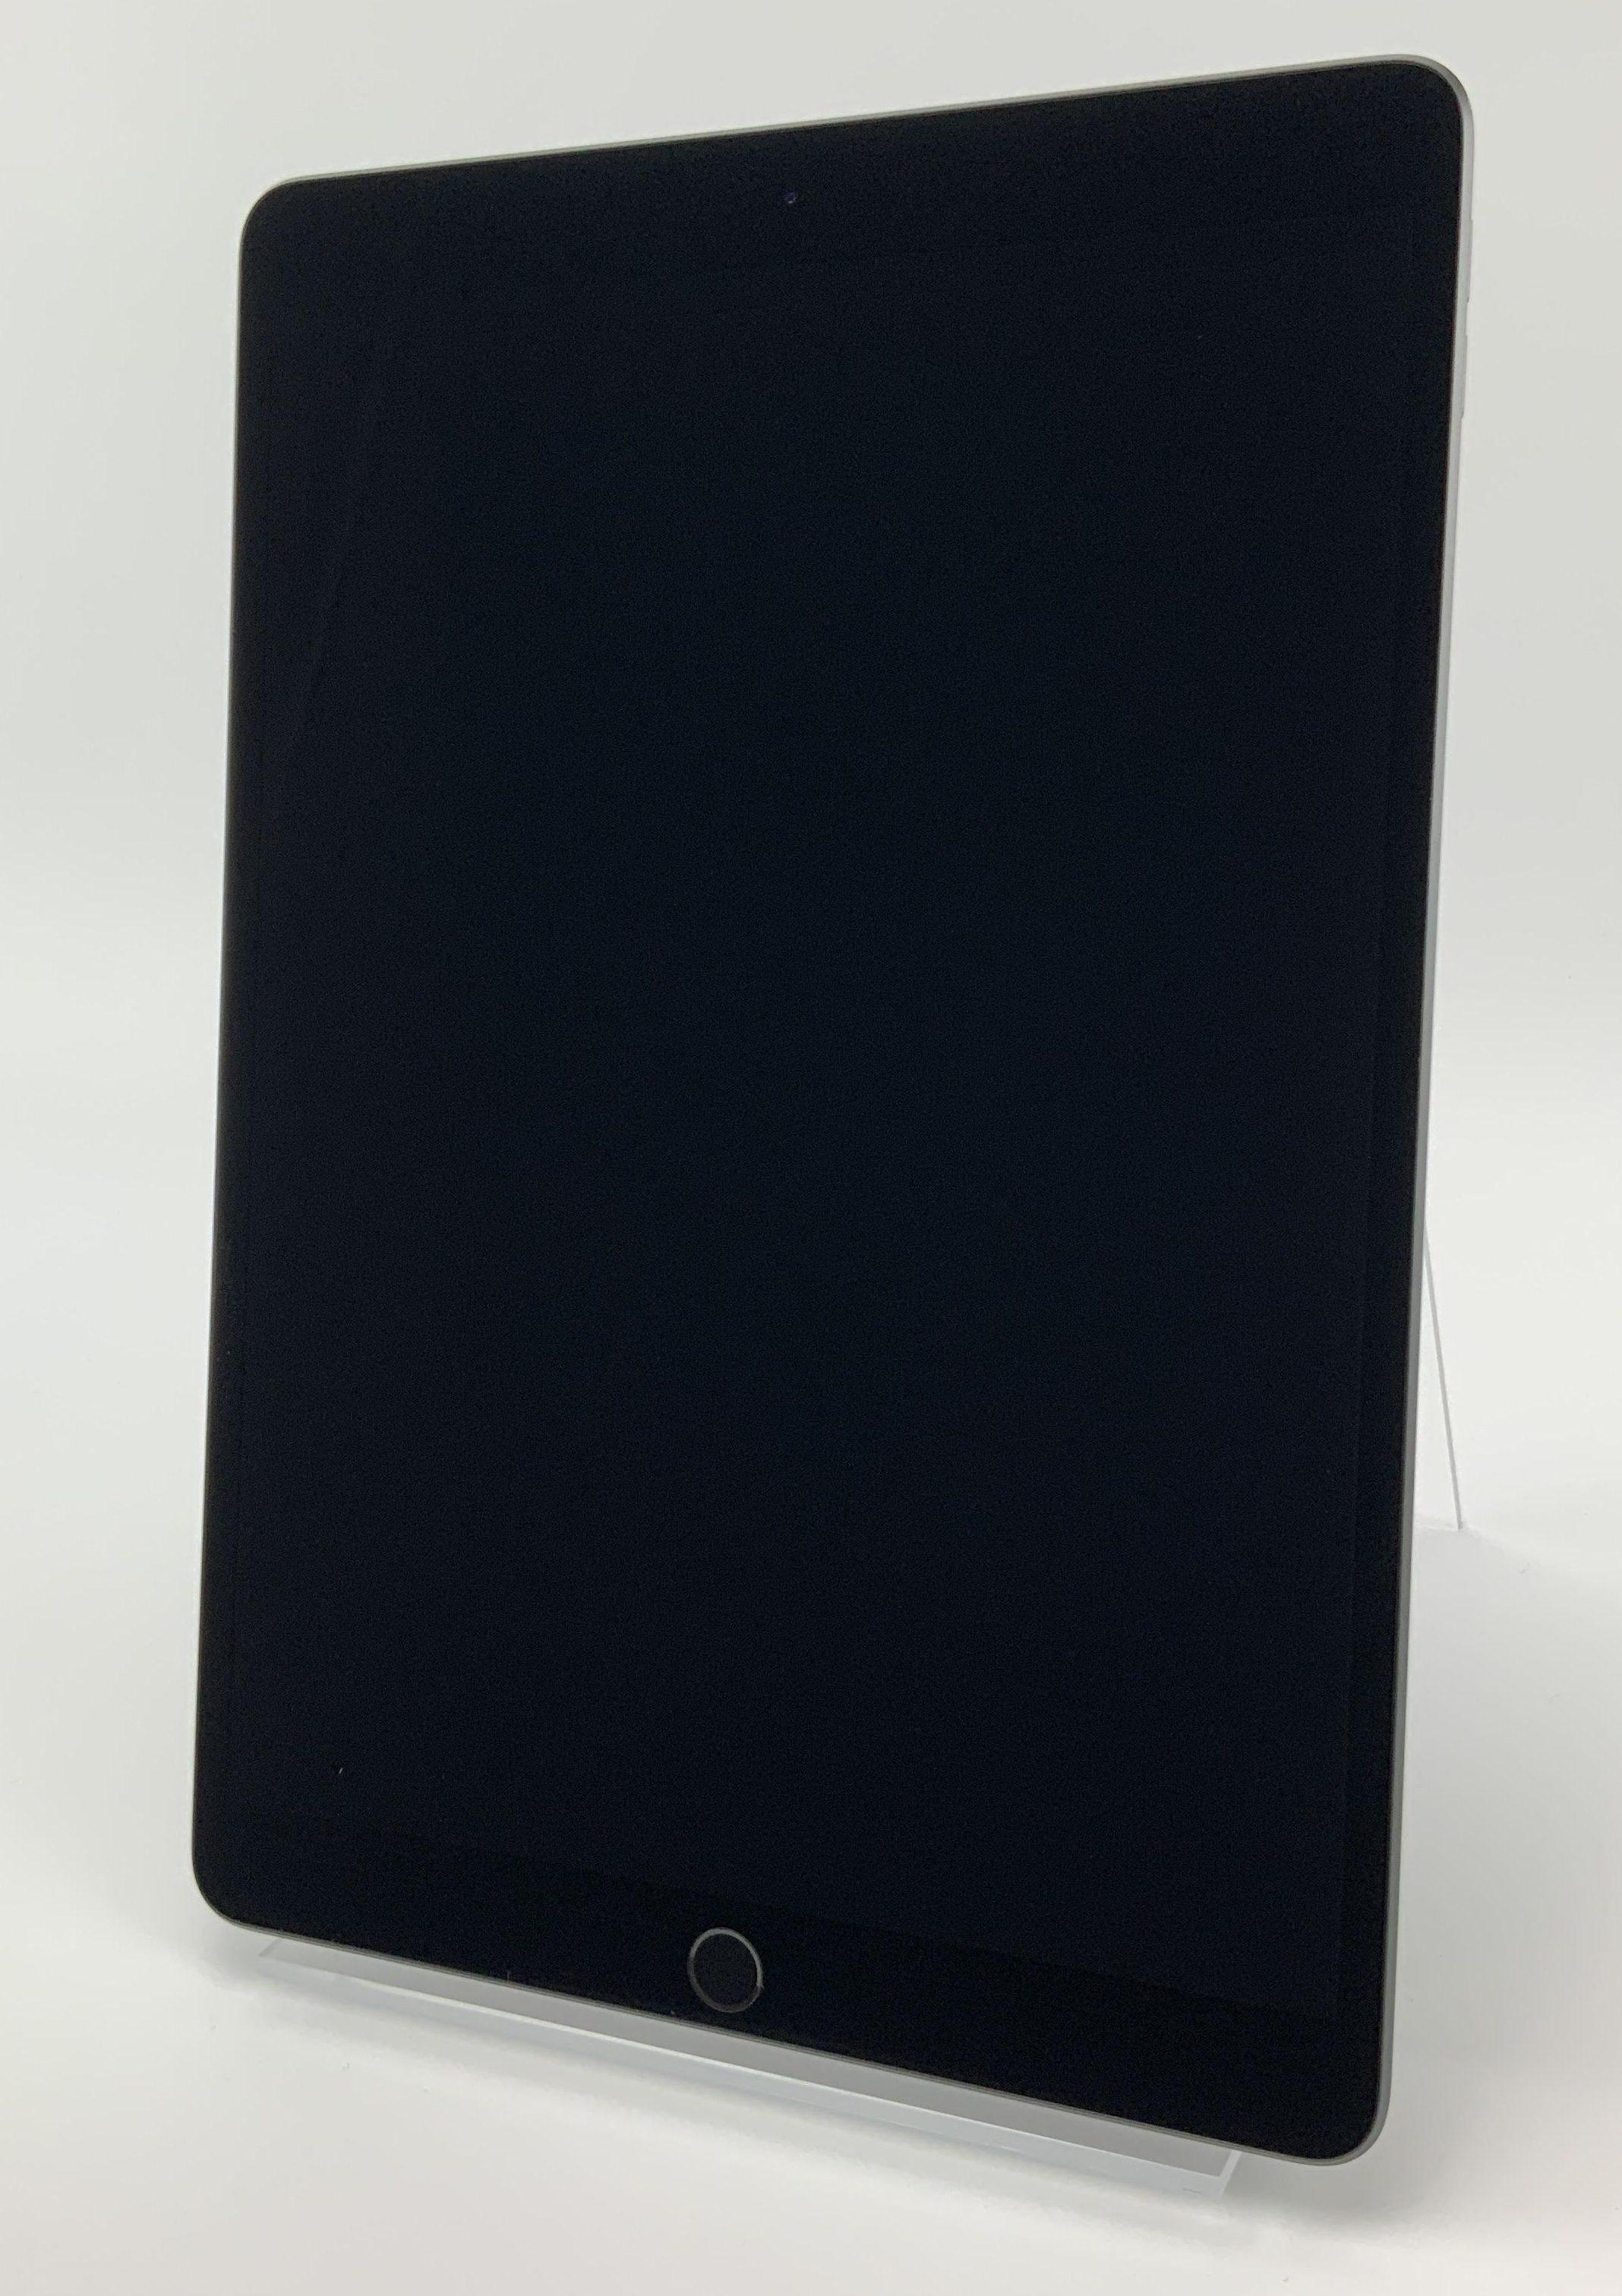 iPad Air 3 Wi-Fi 64GB, 64GB, Space Gray, imagen 1